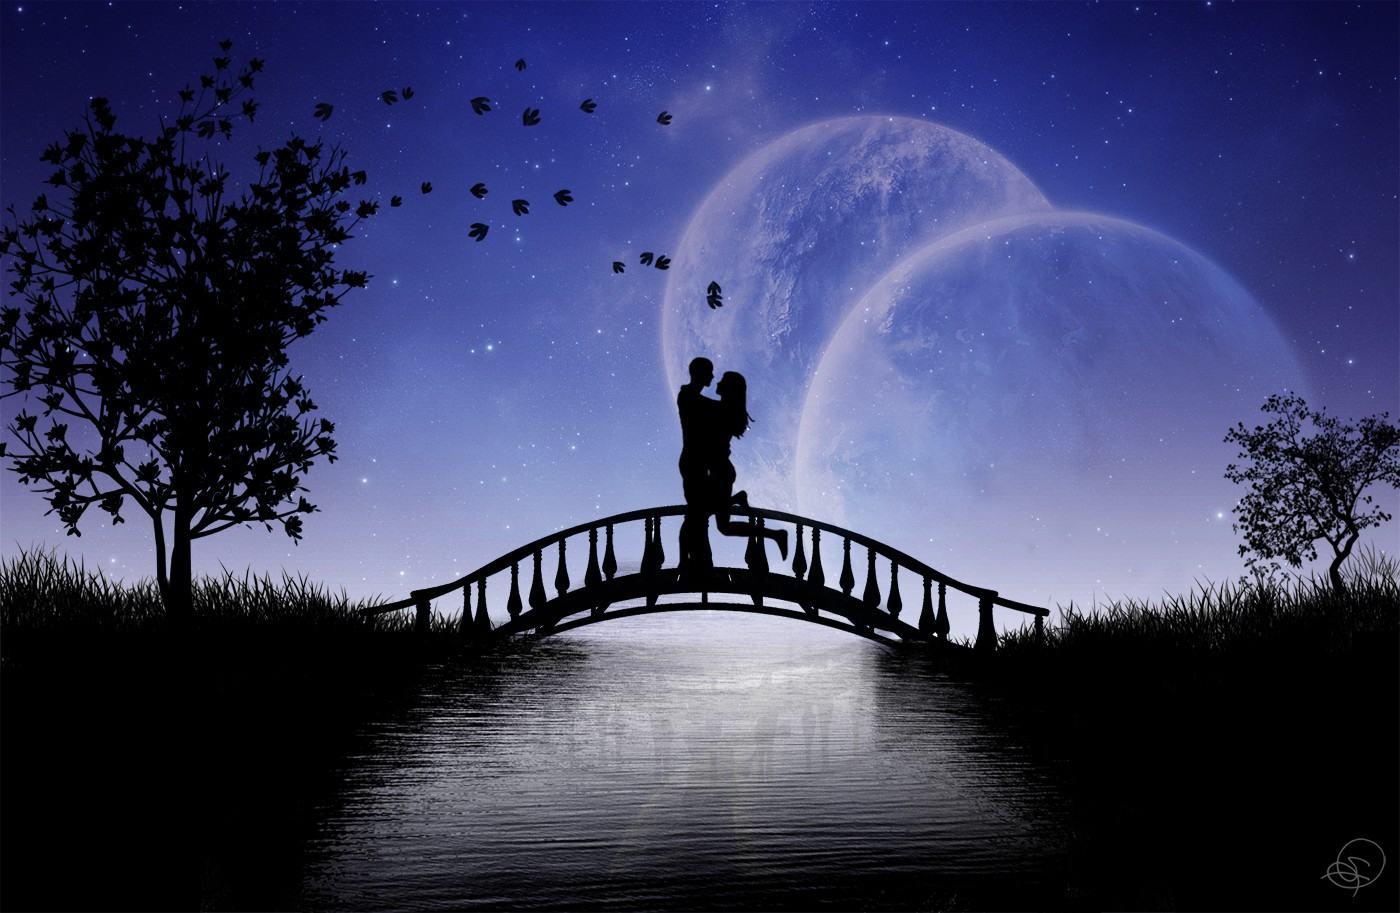 Romantic Mobile Wallpapers Romantic Images